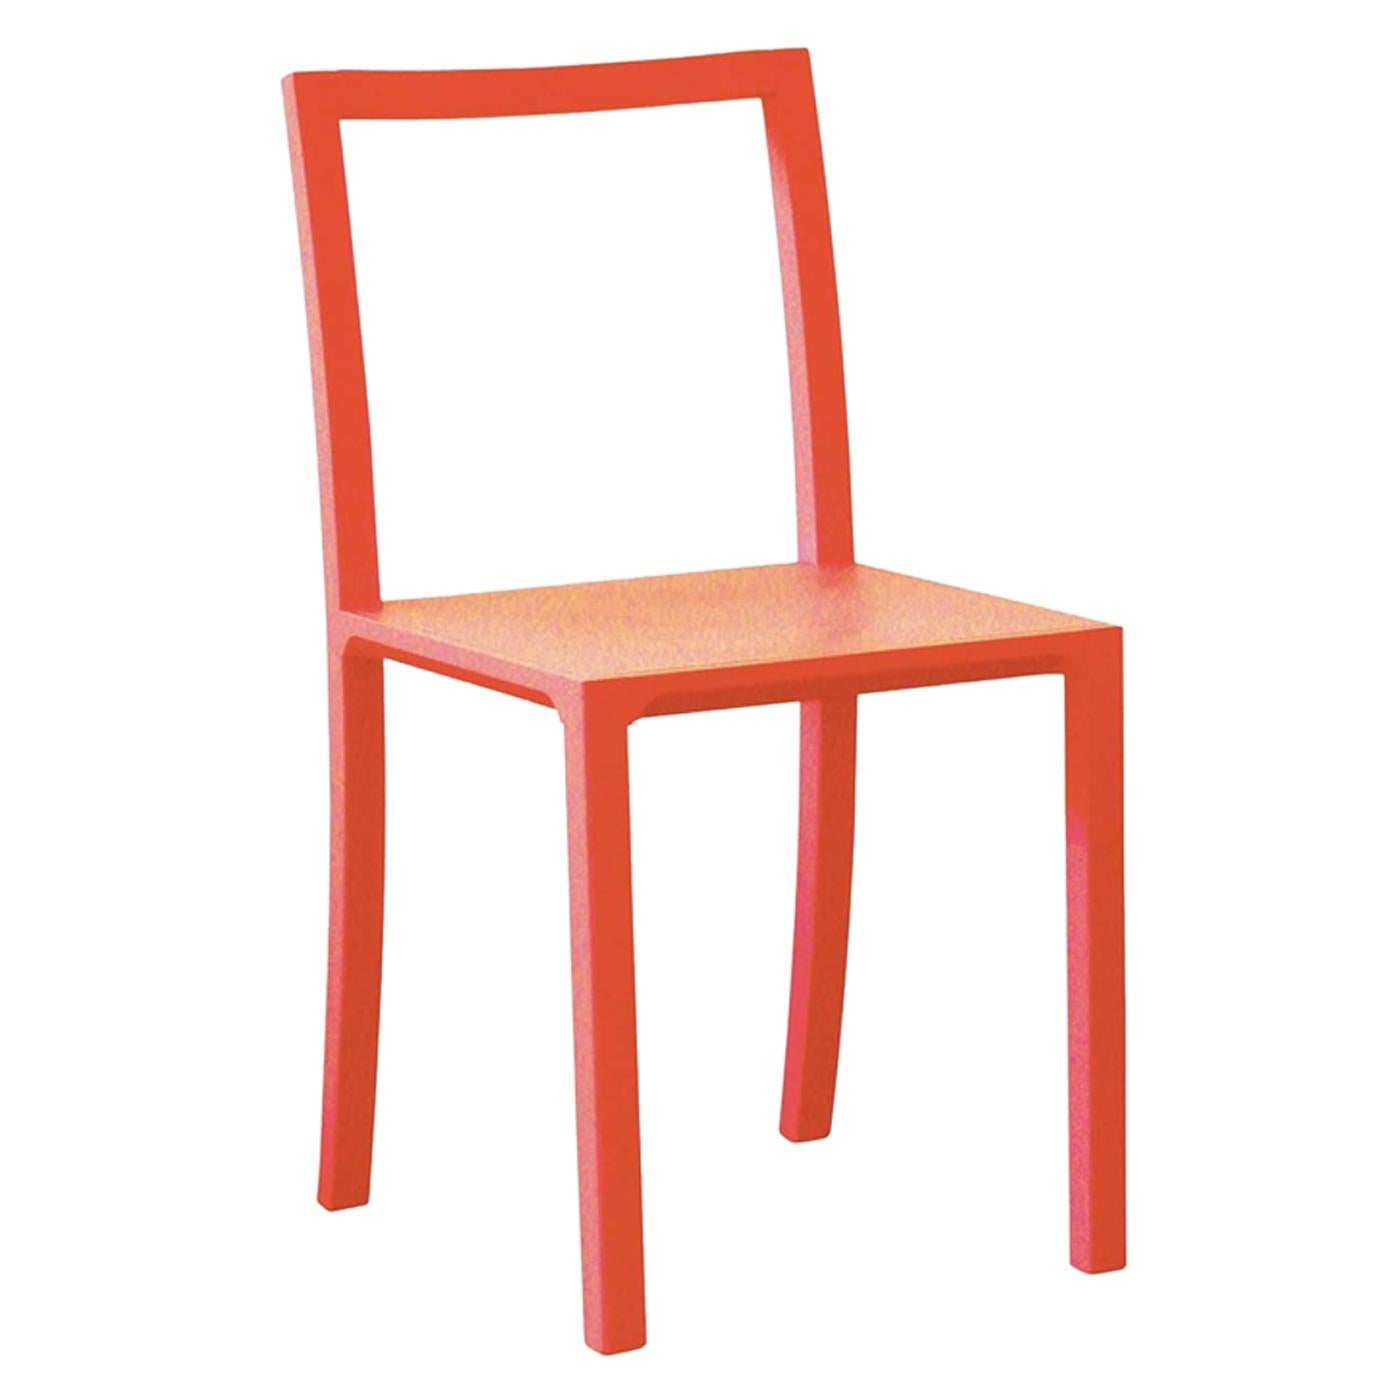 Framework Set of 2 Orange Chairs by Steffen Kehrle